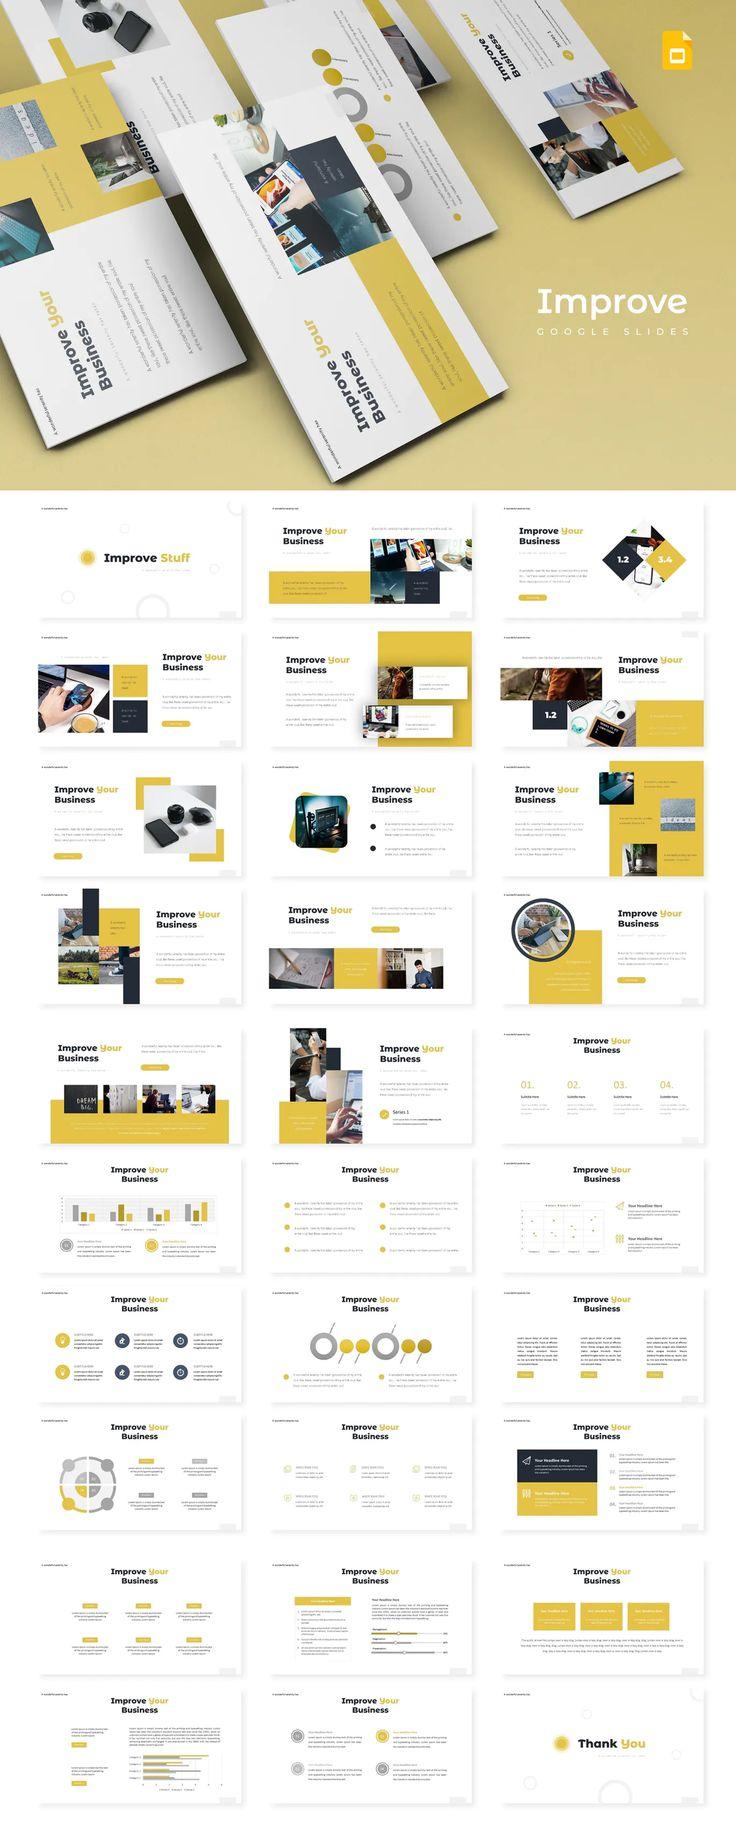 Improve - Google Slides Presentation Template